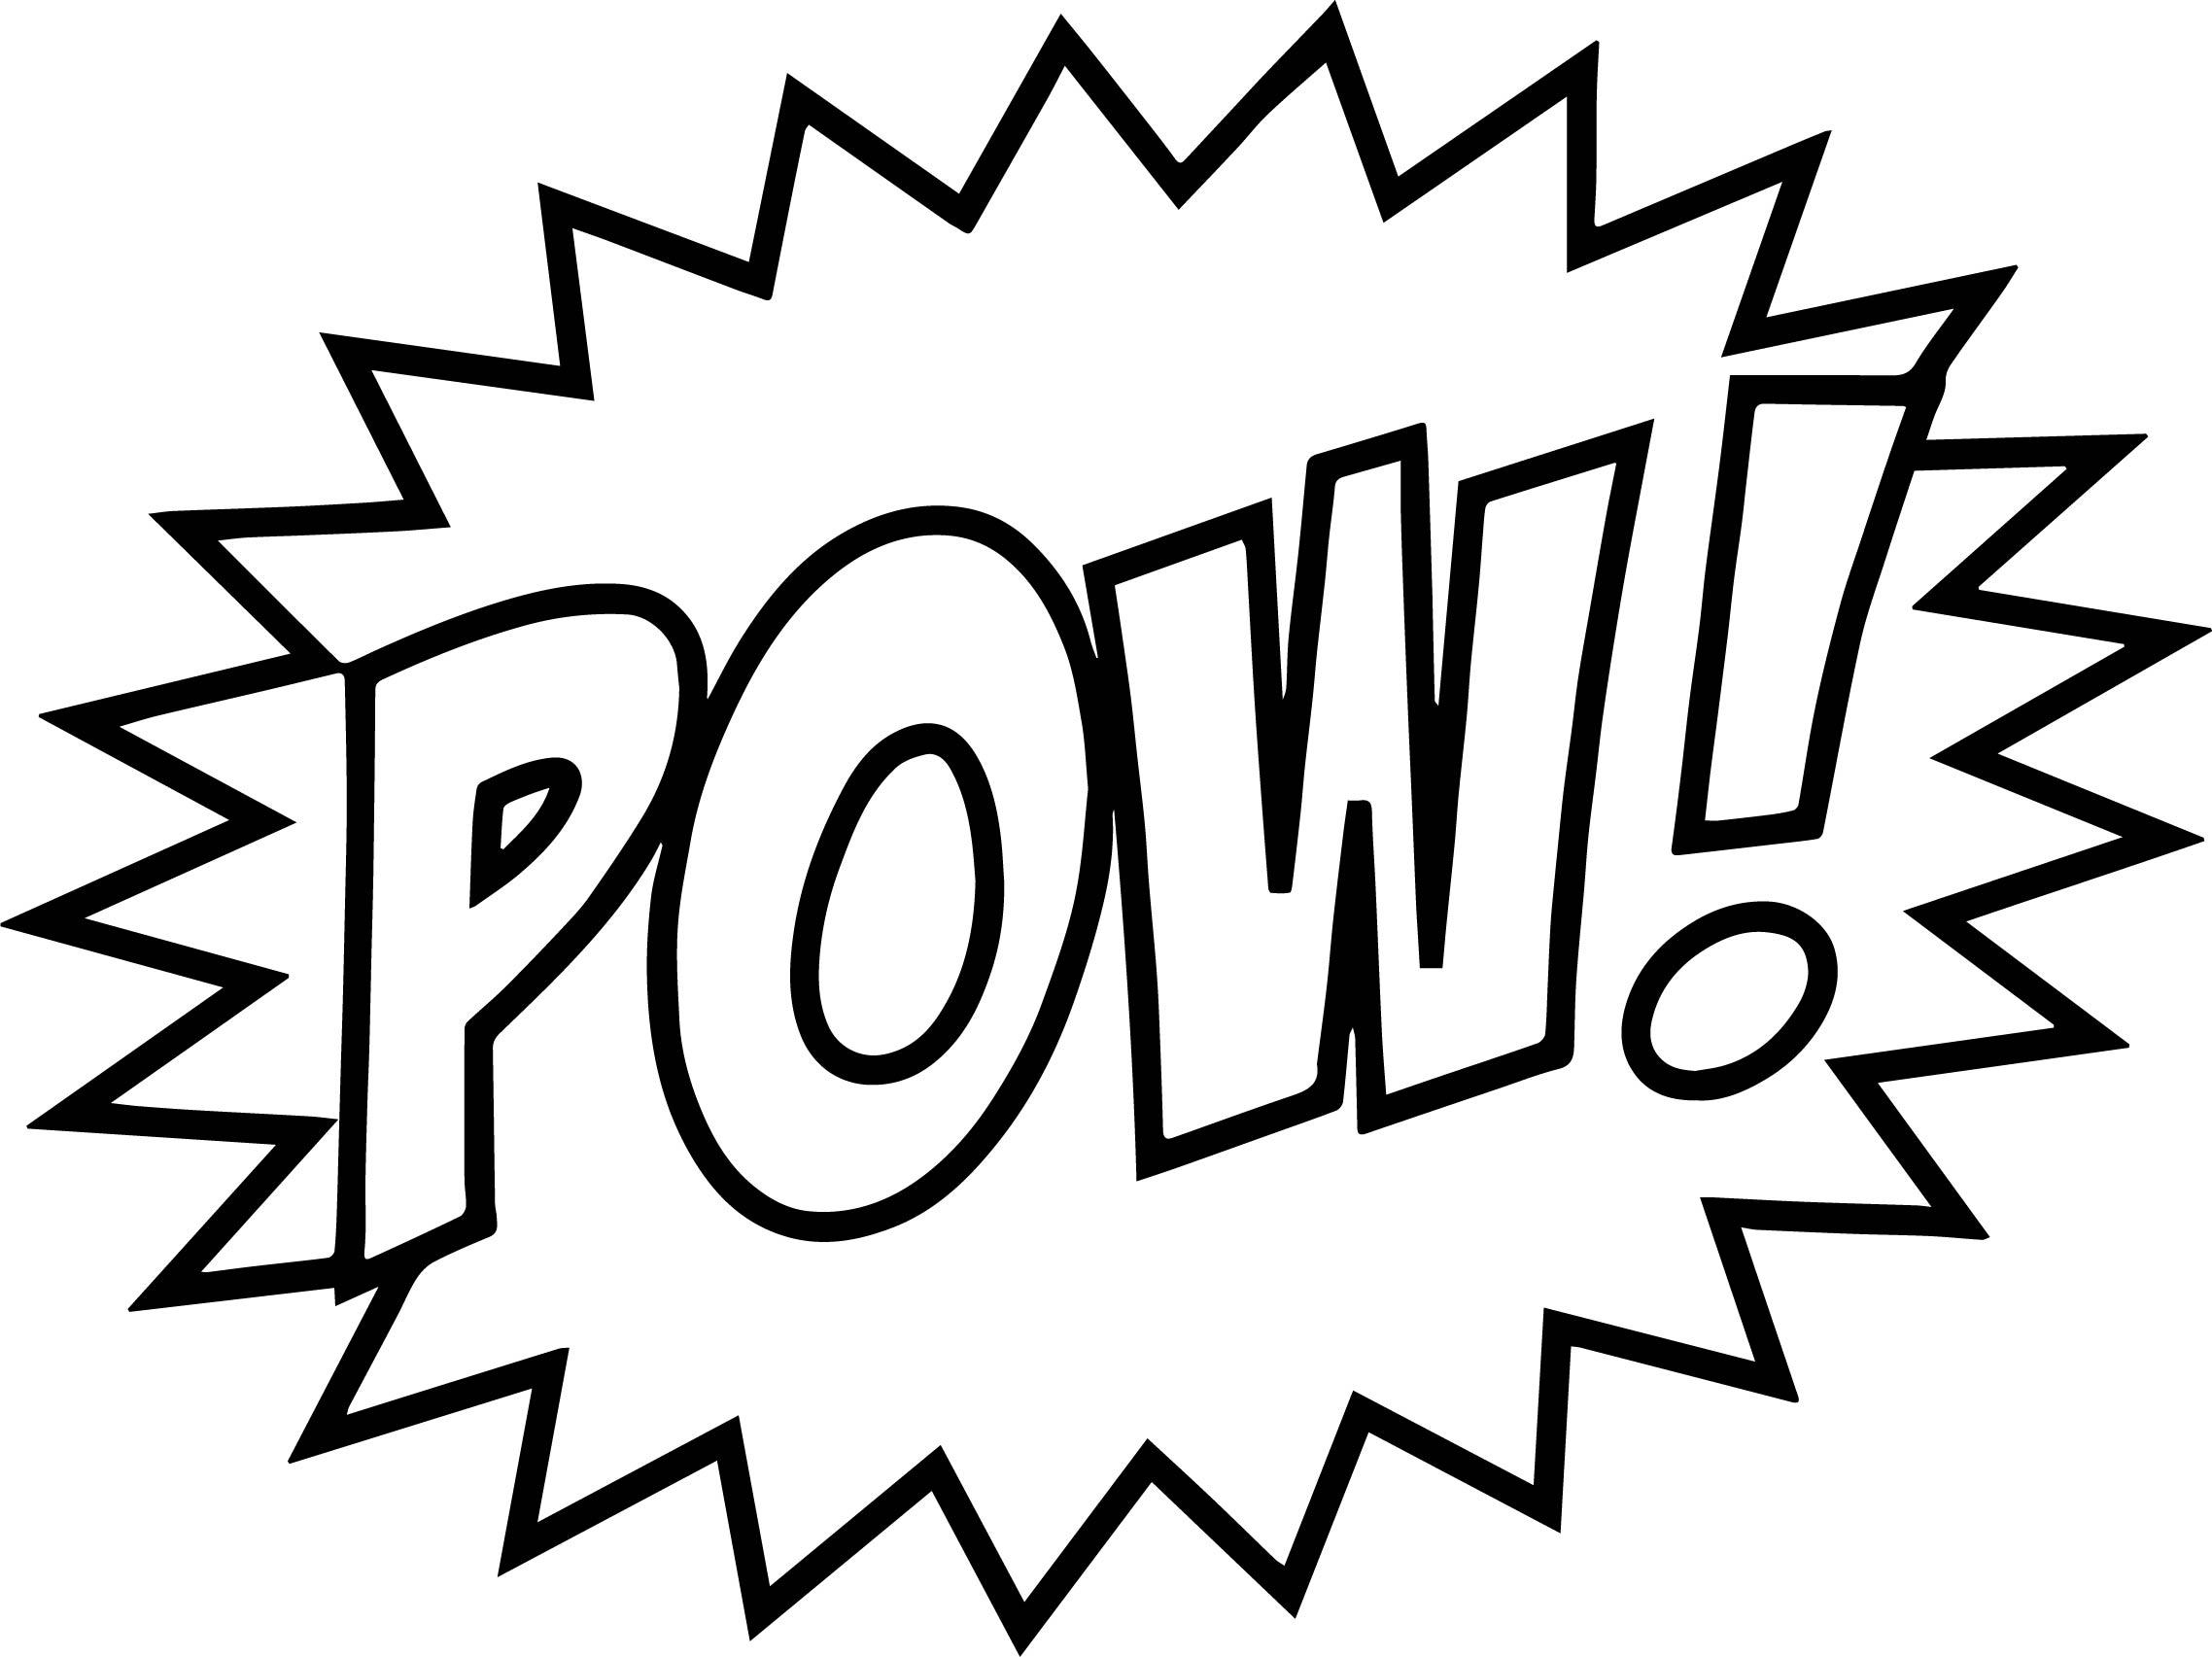 Superhero Batman Batmobile Coloring Sheets Printable Kids: Batman Words Pow Text Coloring Page